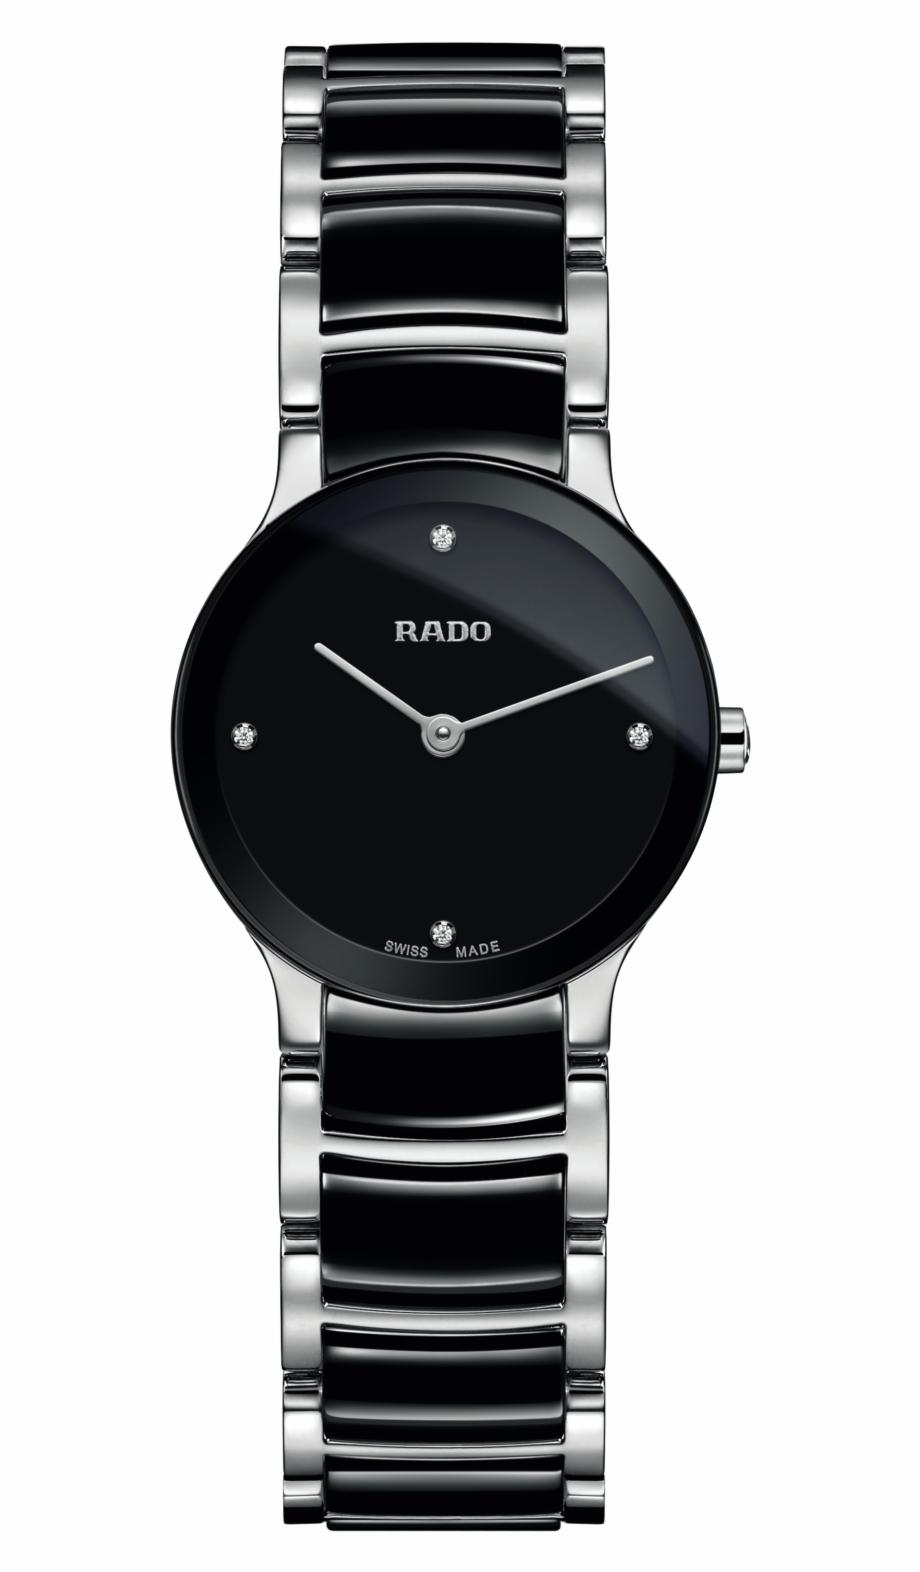 Ladies watch clipart download Rado Ladies Watches Free PNG Images & Clipart Download ... download